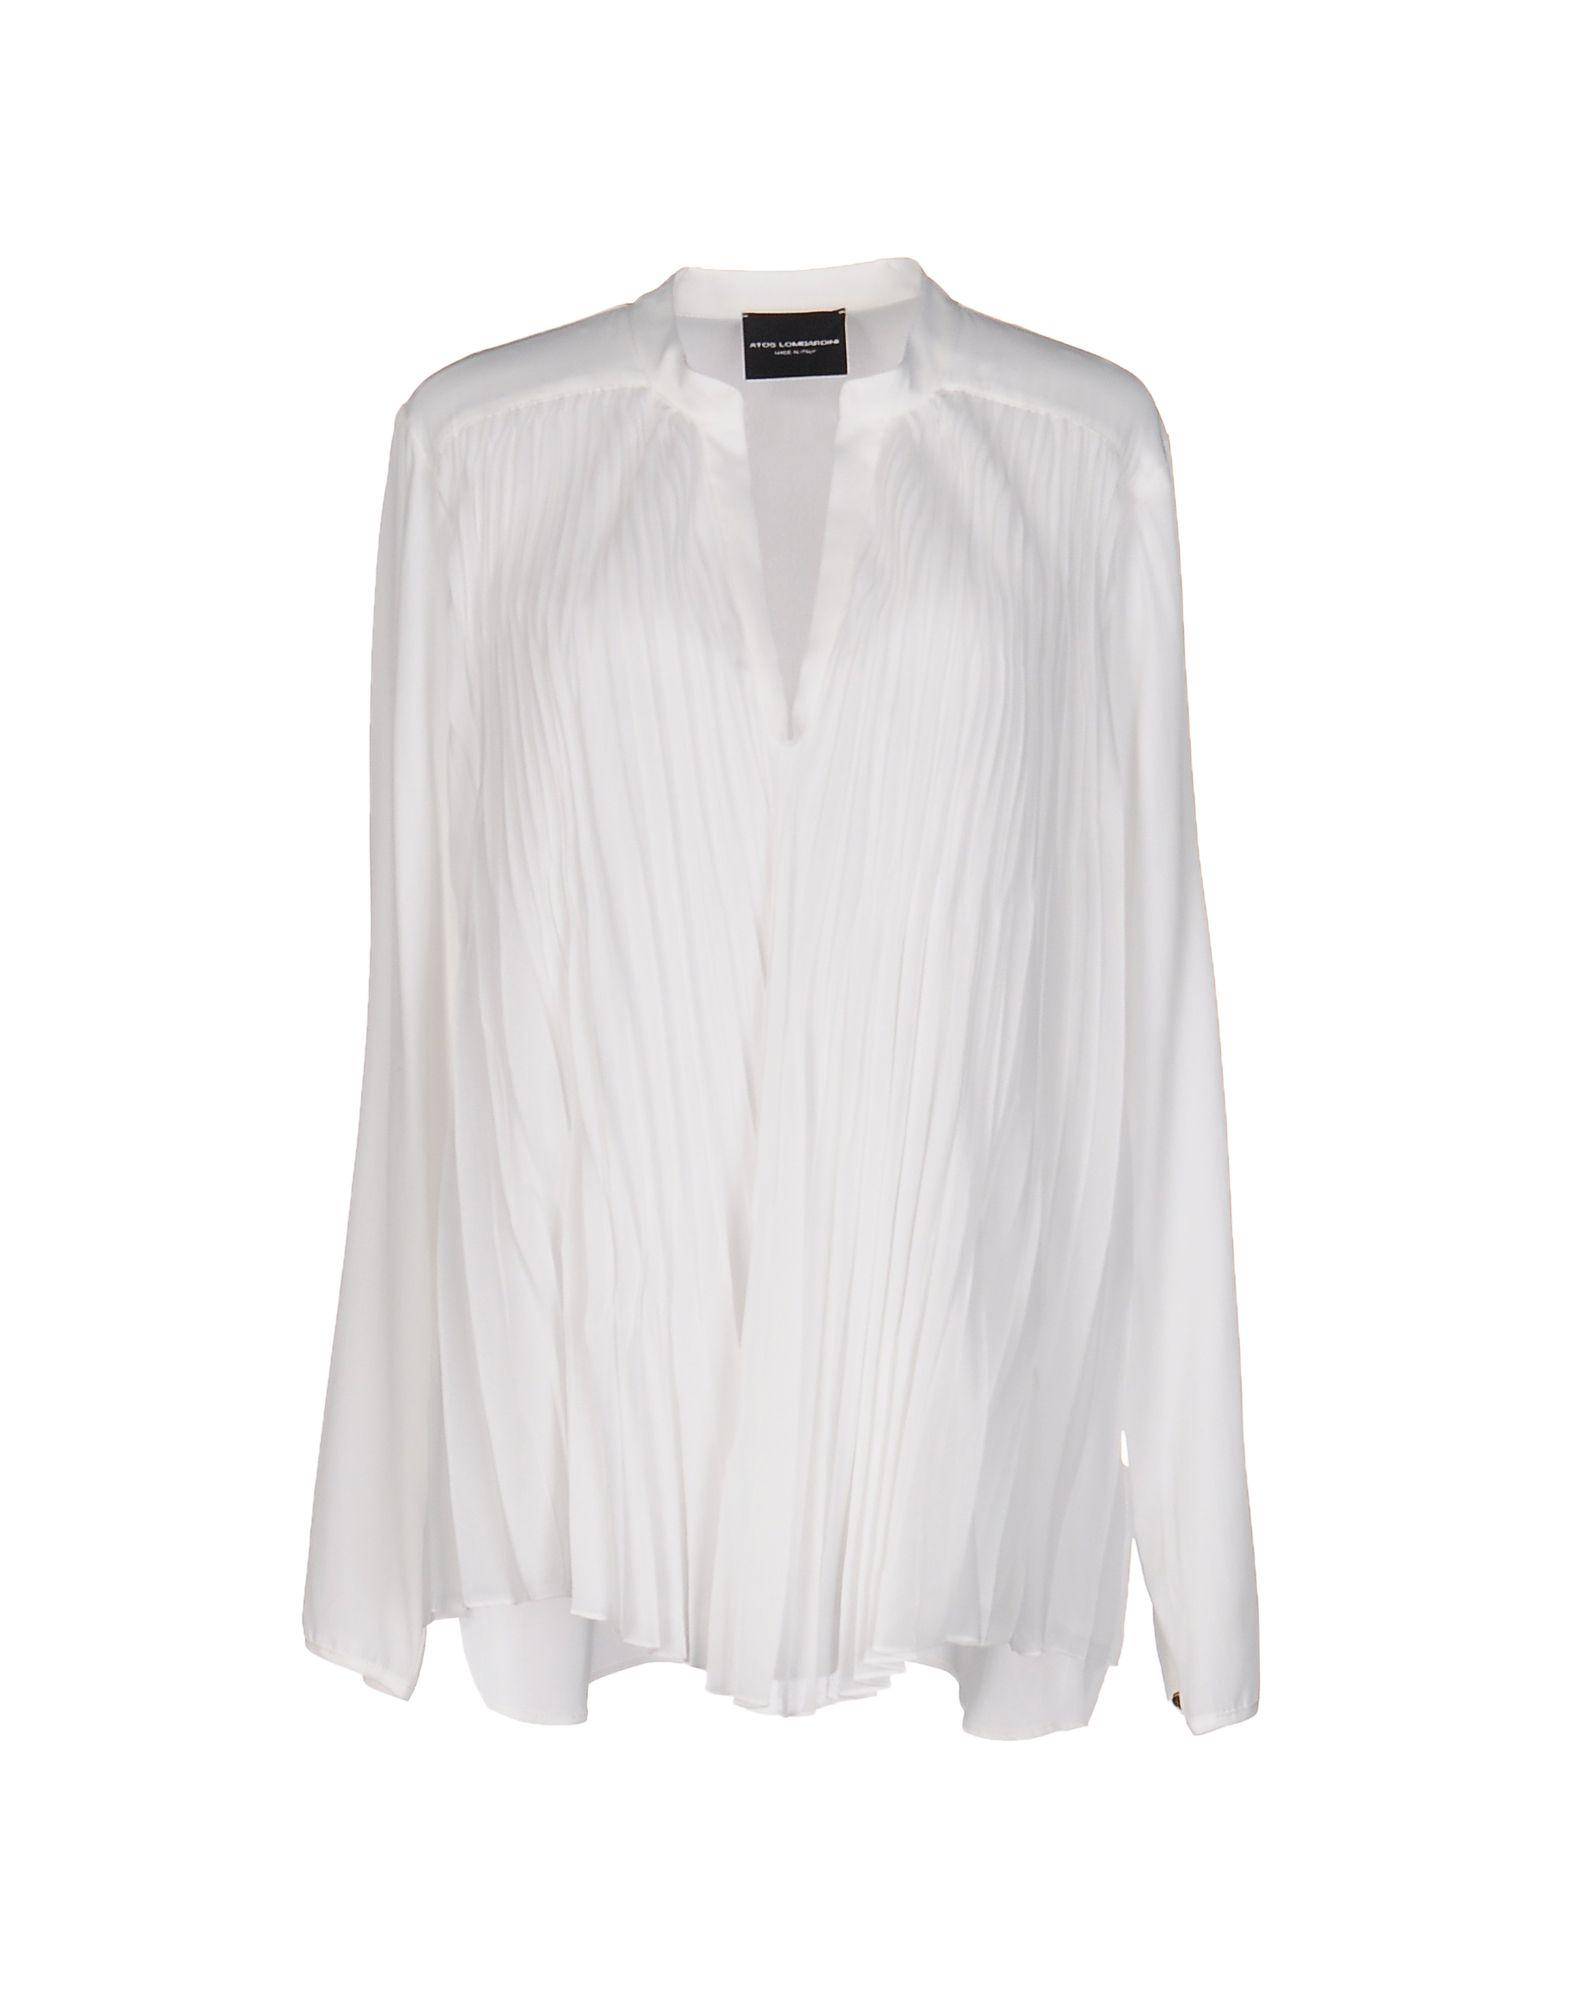 ATOS LOMBARDINI Damen Bluse Farbe Weiß Größe 5